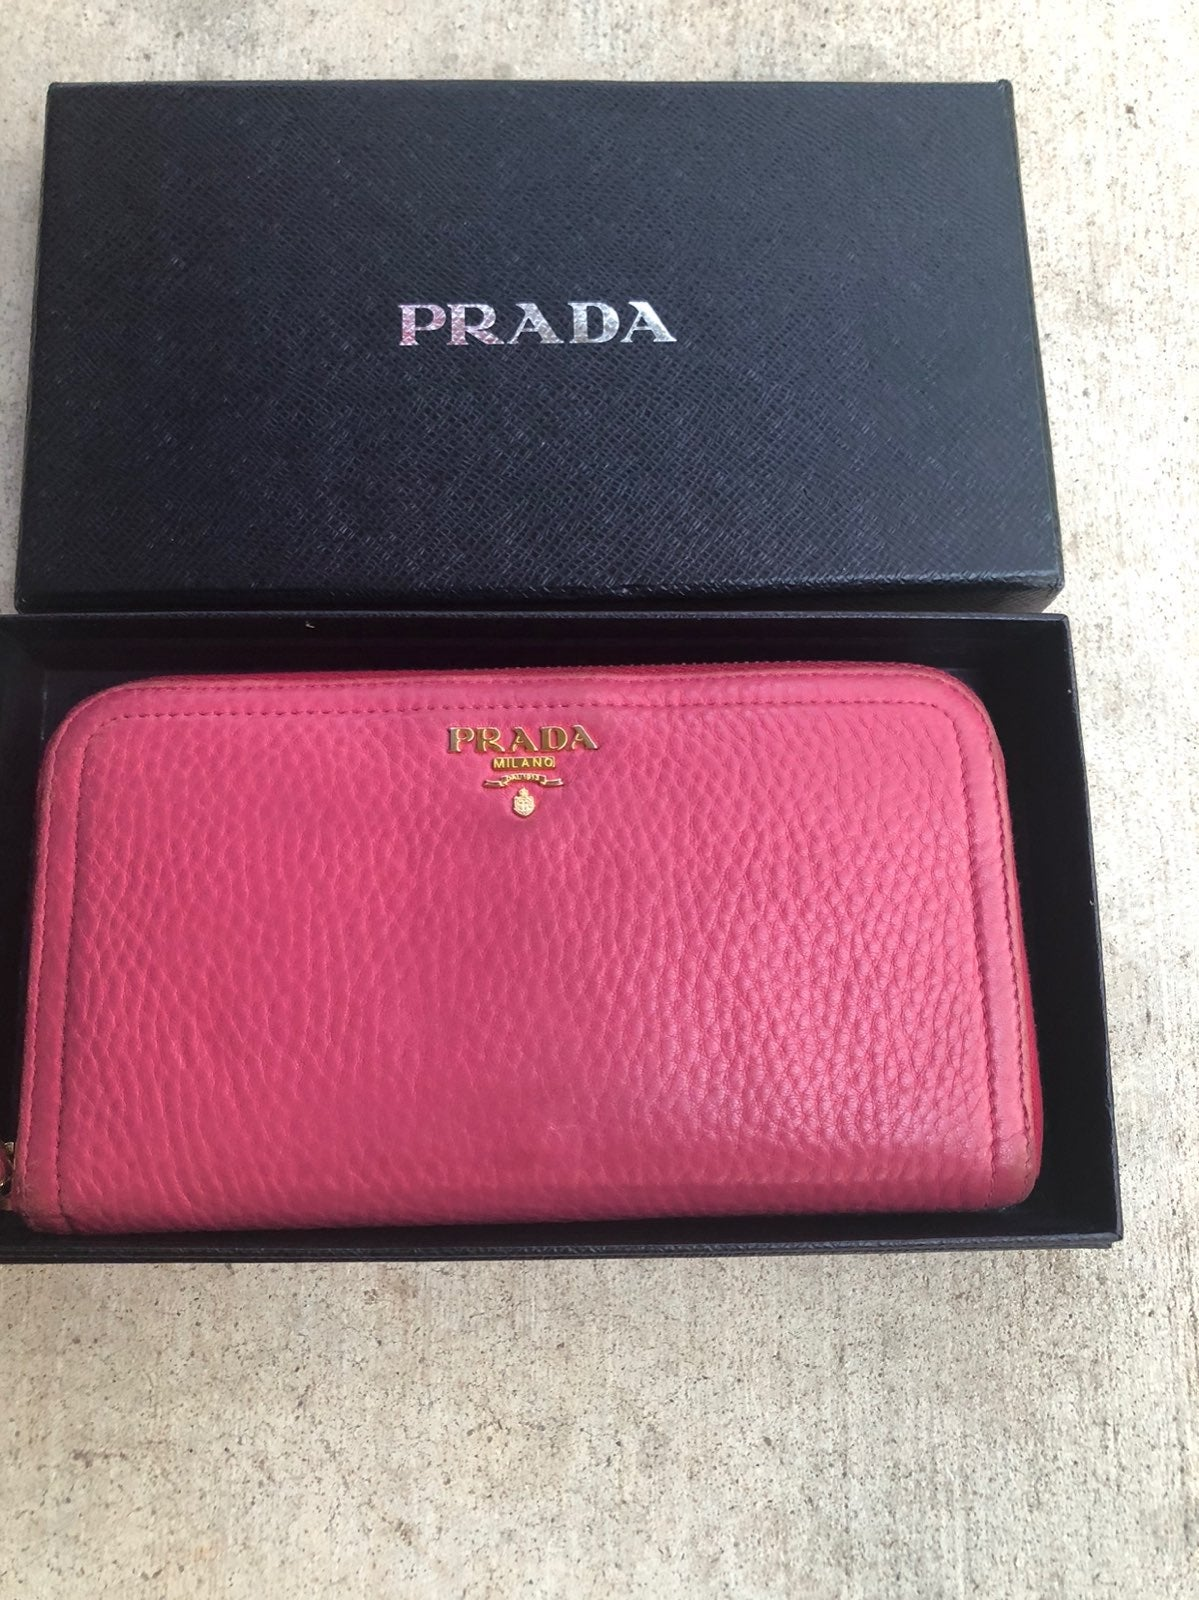 Prada Pink Zippy Wallet